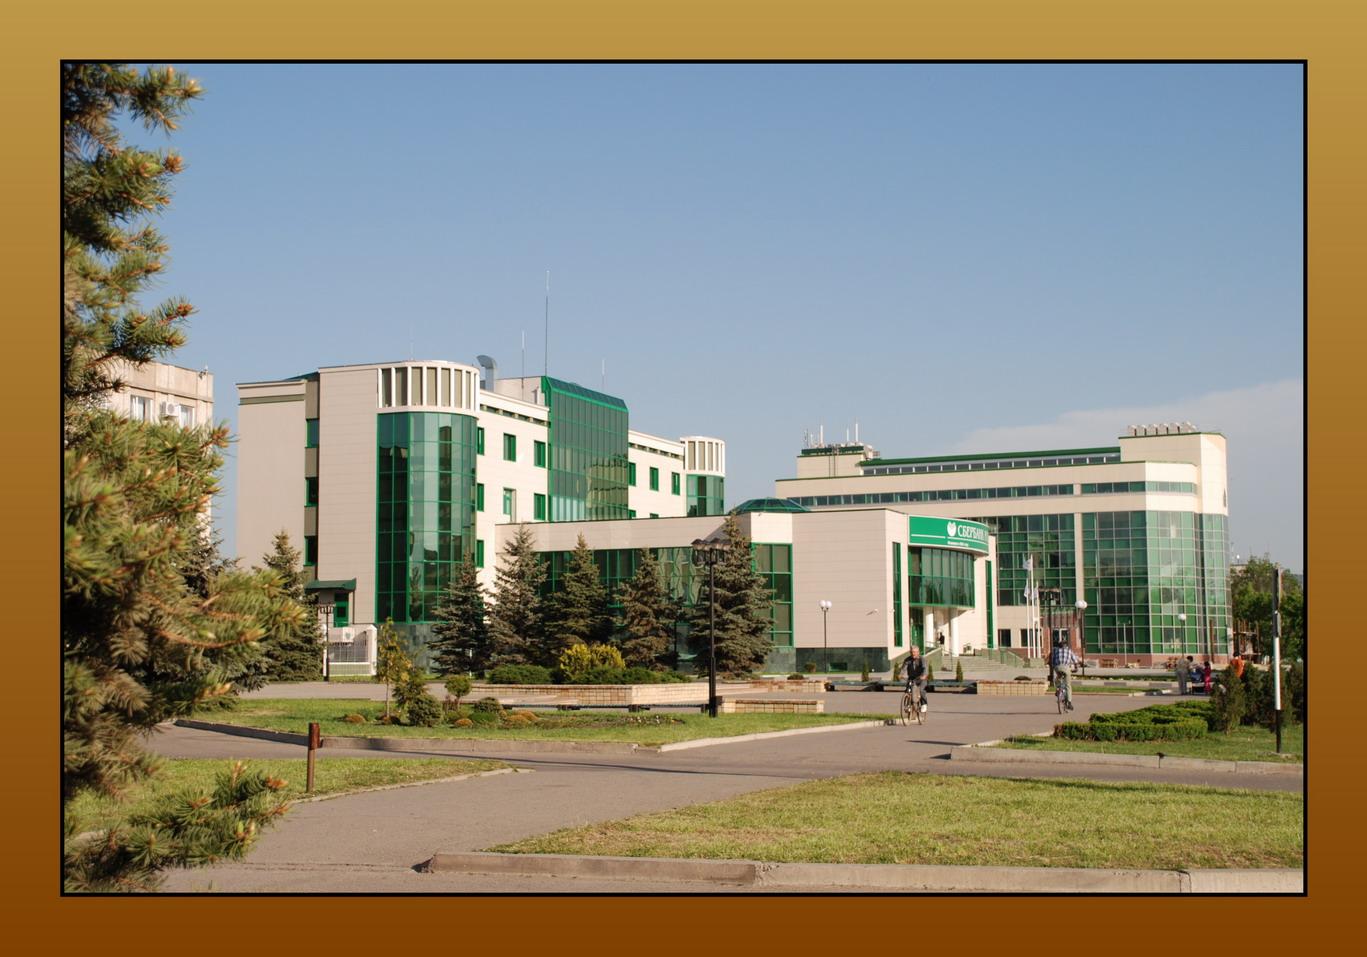 http://www.ljplus.ru/img4/a/r/arthoma/sber-i-TC.jpg